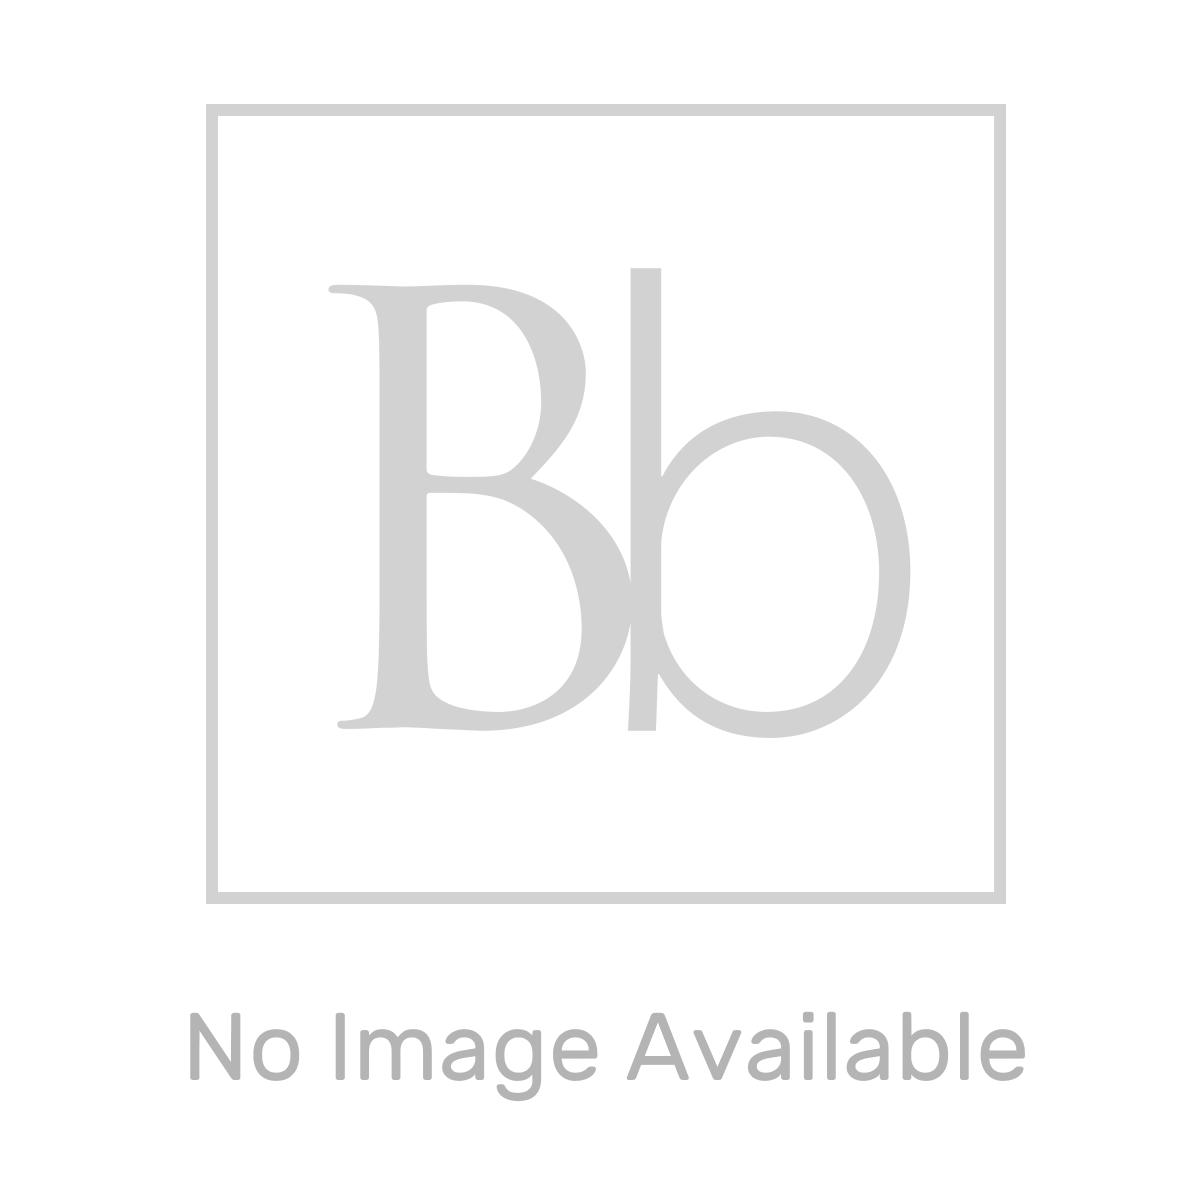 Zenith Stainless Steel Corner Bathroom Cabinet